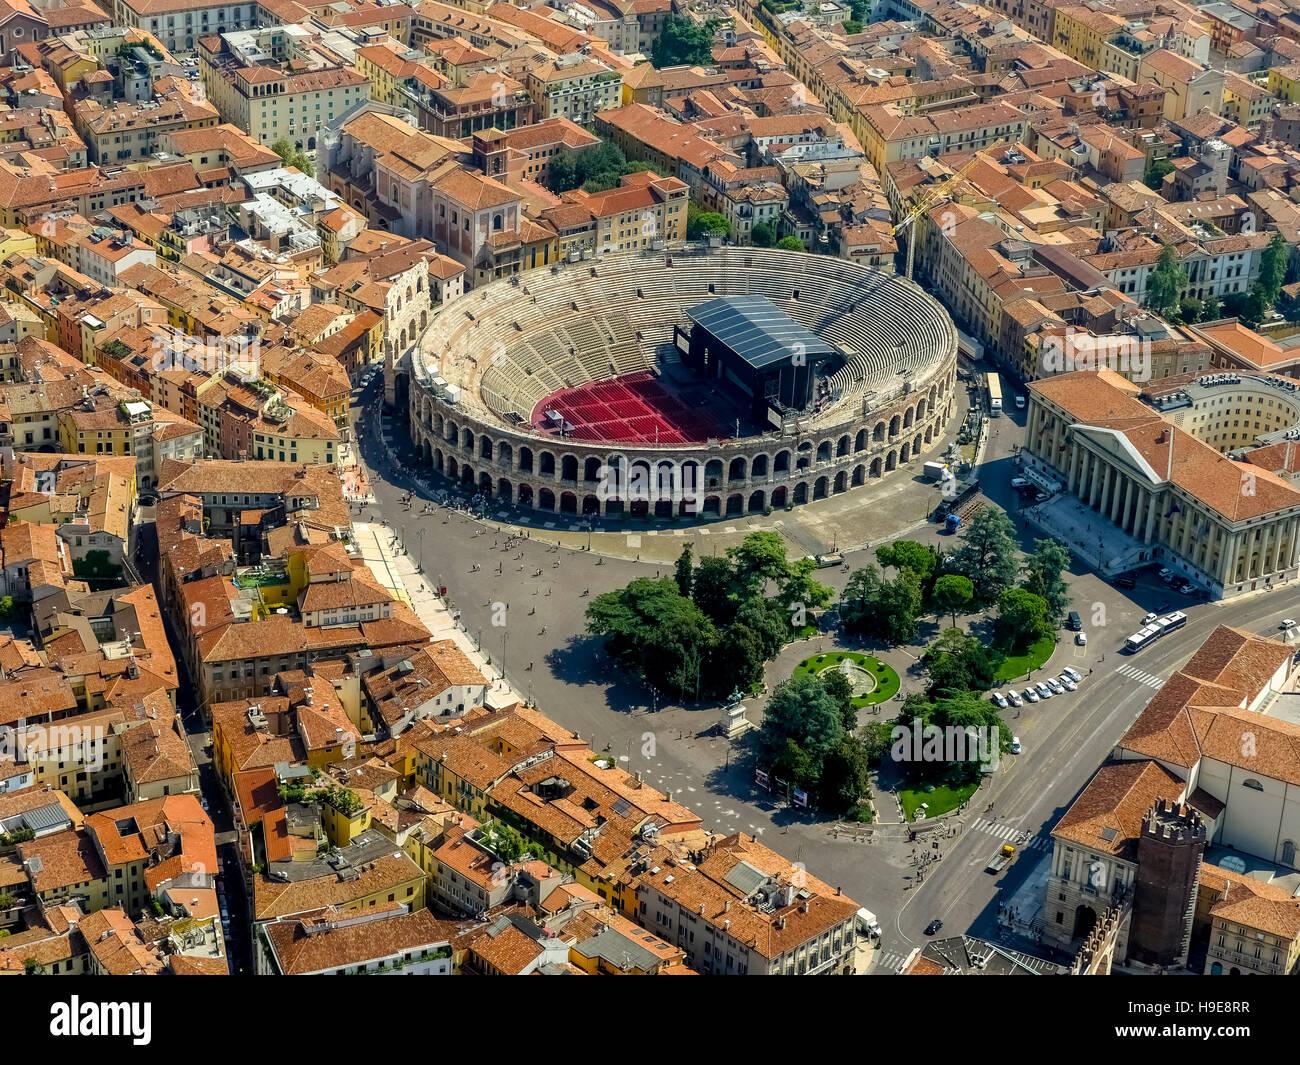 Aerial view, Barbieri Palace, Palazzo Barbieri, Arena di Verona, Piazza Bra, Roman amphitheater, the city center - Stock Image